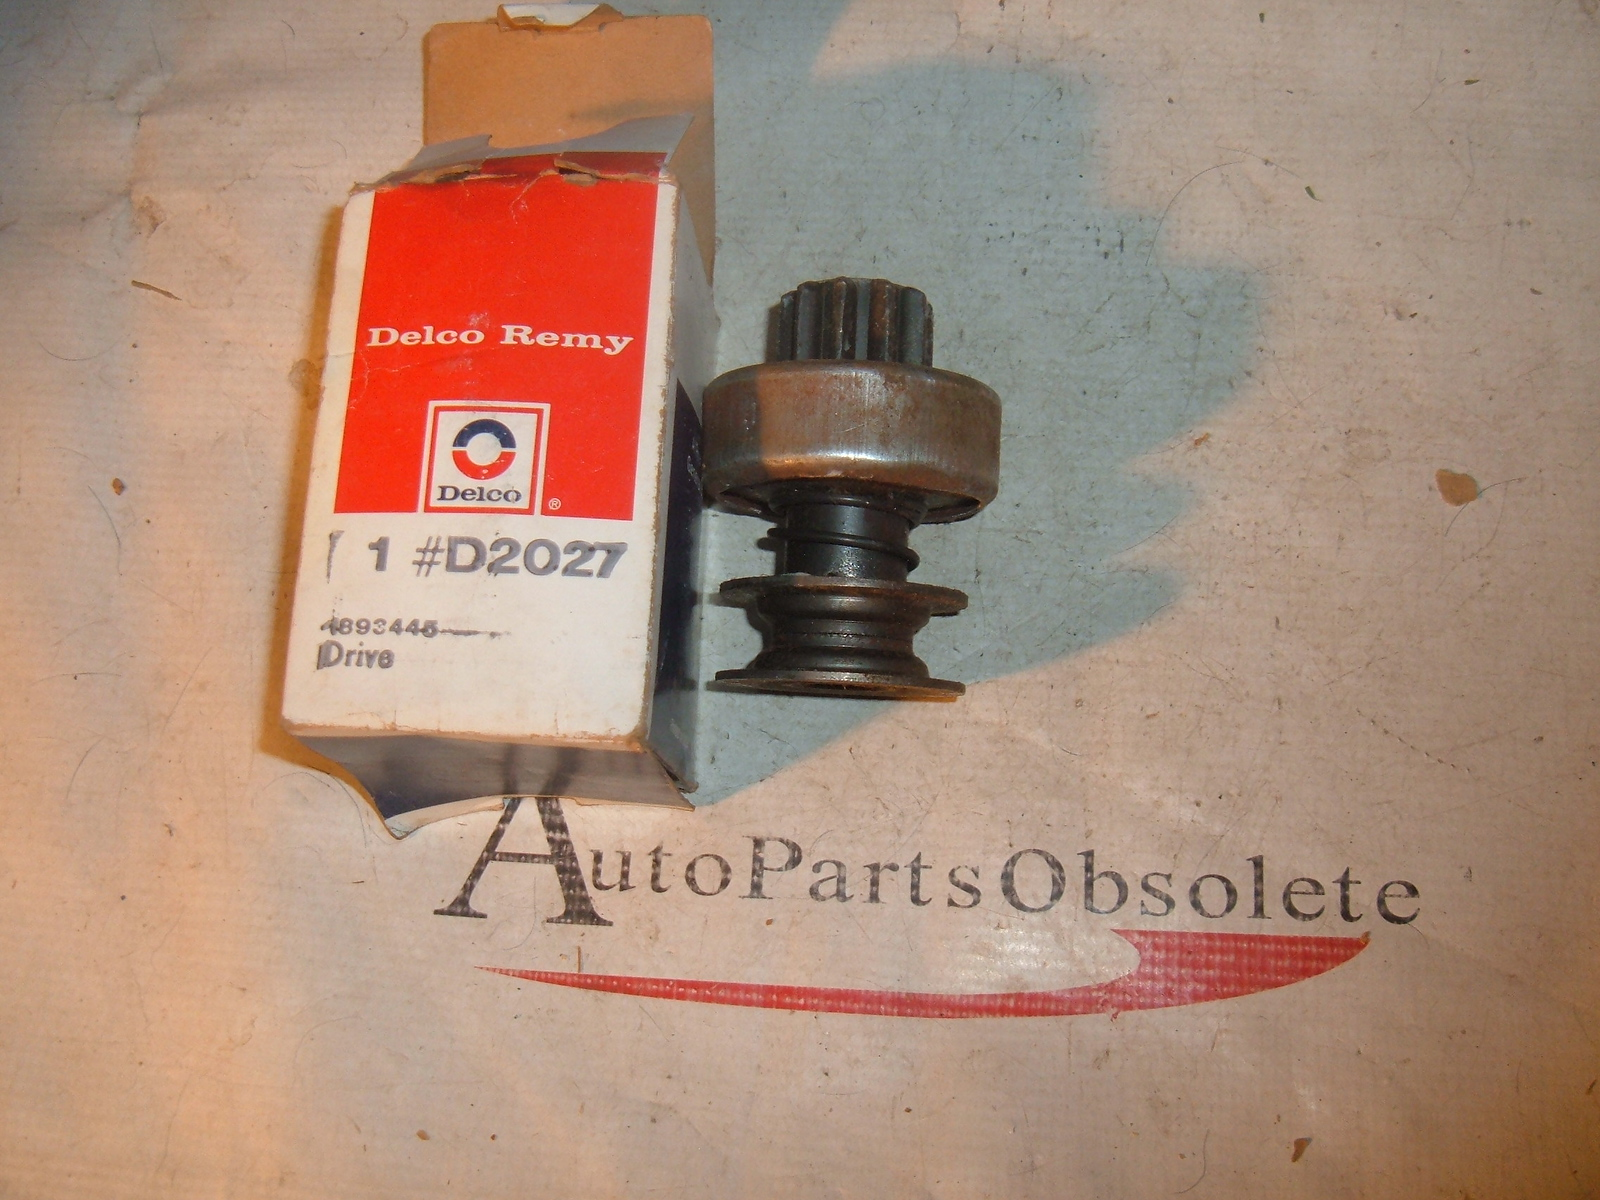 View Product1982 83 84 85 86 8788 Cadillac Pontiac Oldsmobile Chevrolet delco starter drive unit 1893445 (z 1893445)